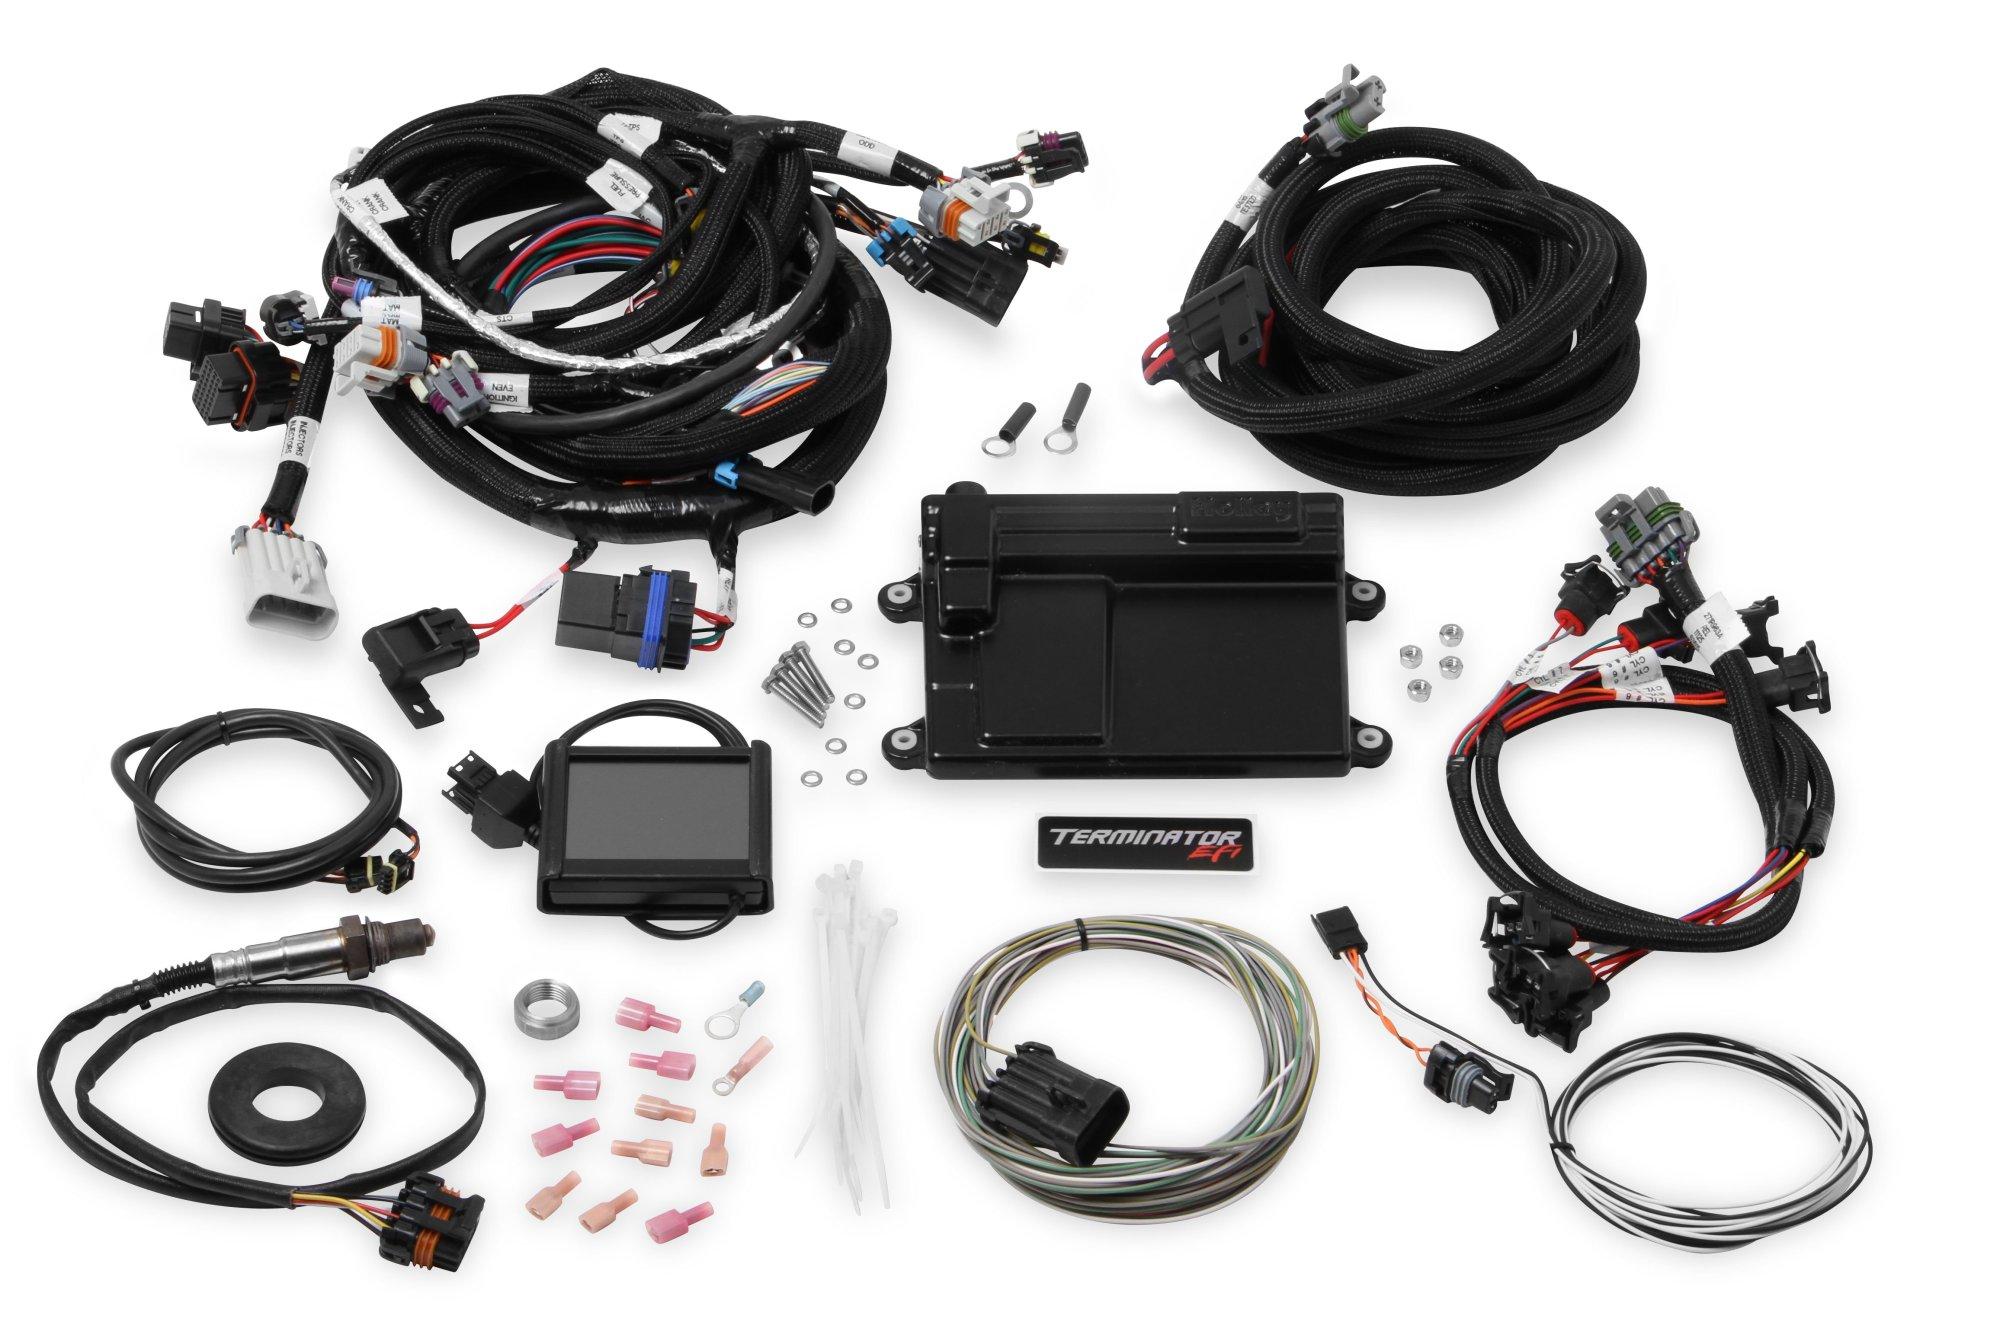 hight resolution of 550 608 terminator ls mpfi kit image